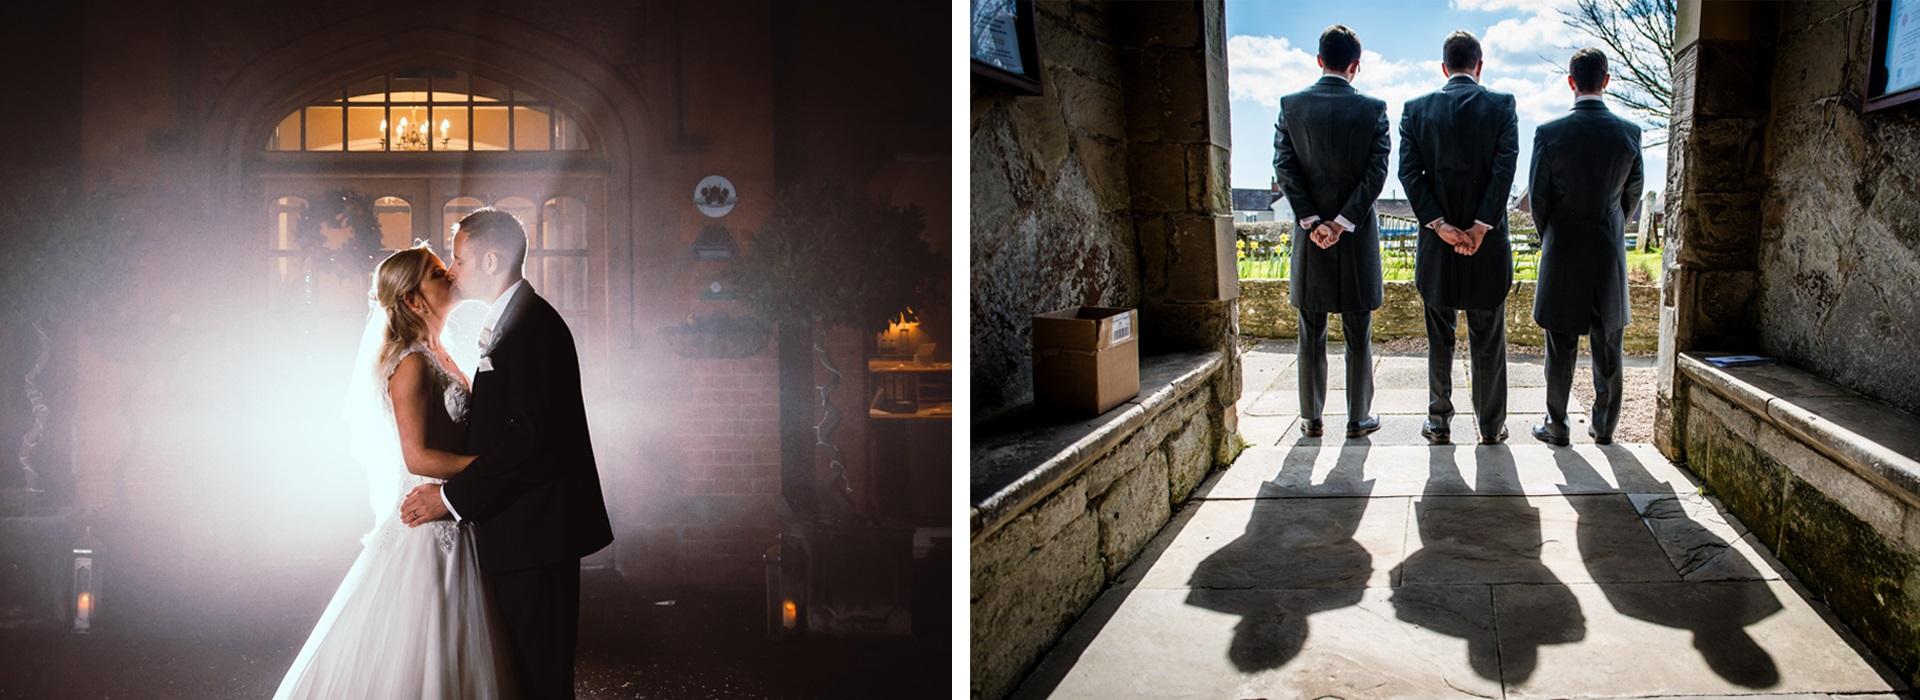 Warwickshire-wedding-photographer-chris-fossey-2